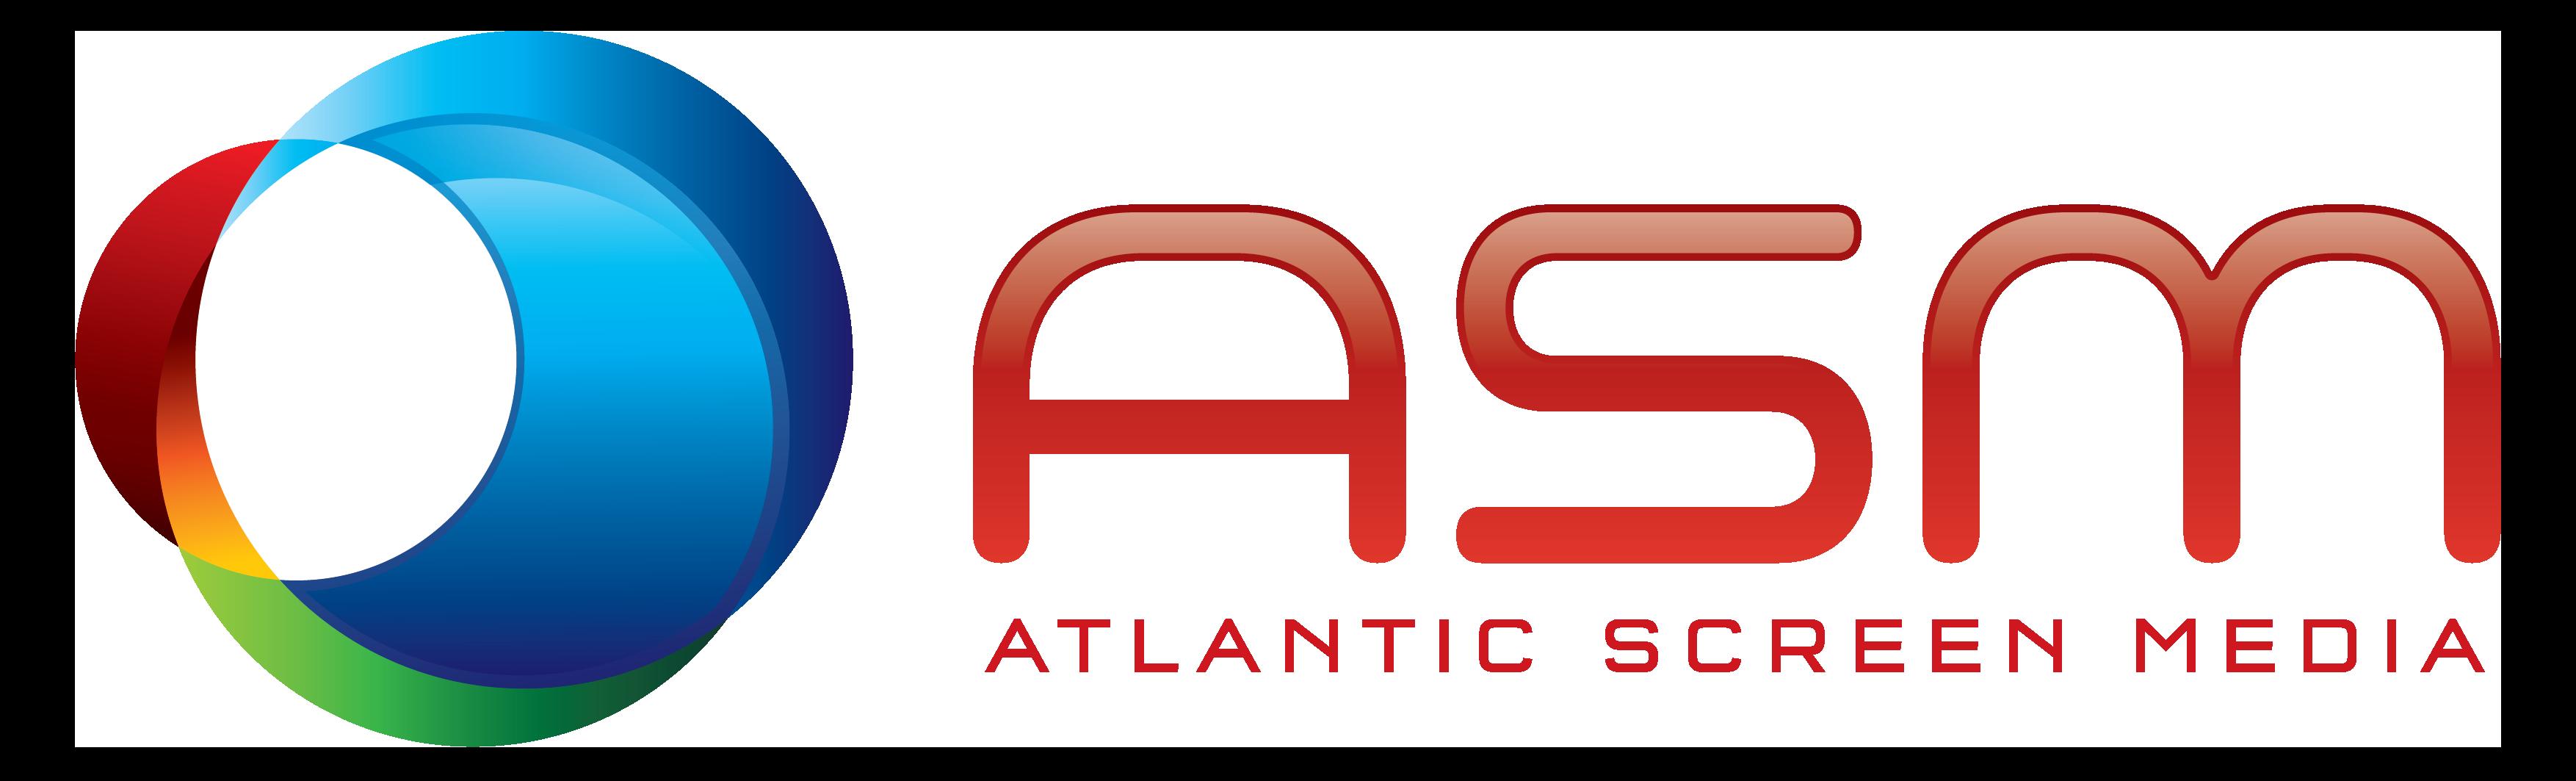 Atlantic Screen Media Fund